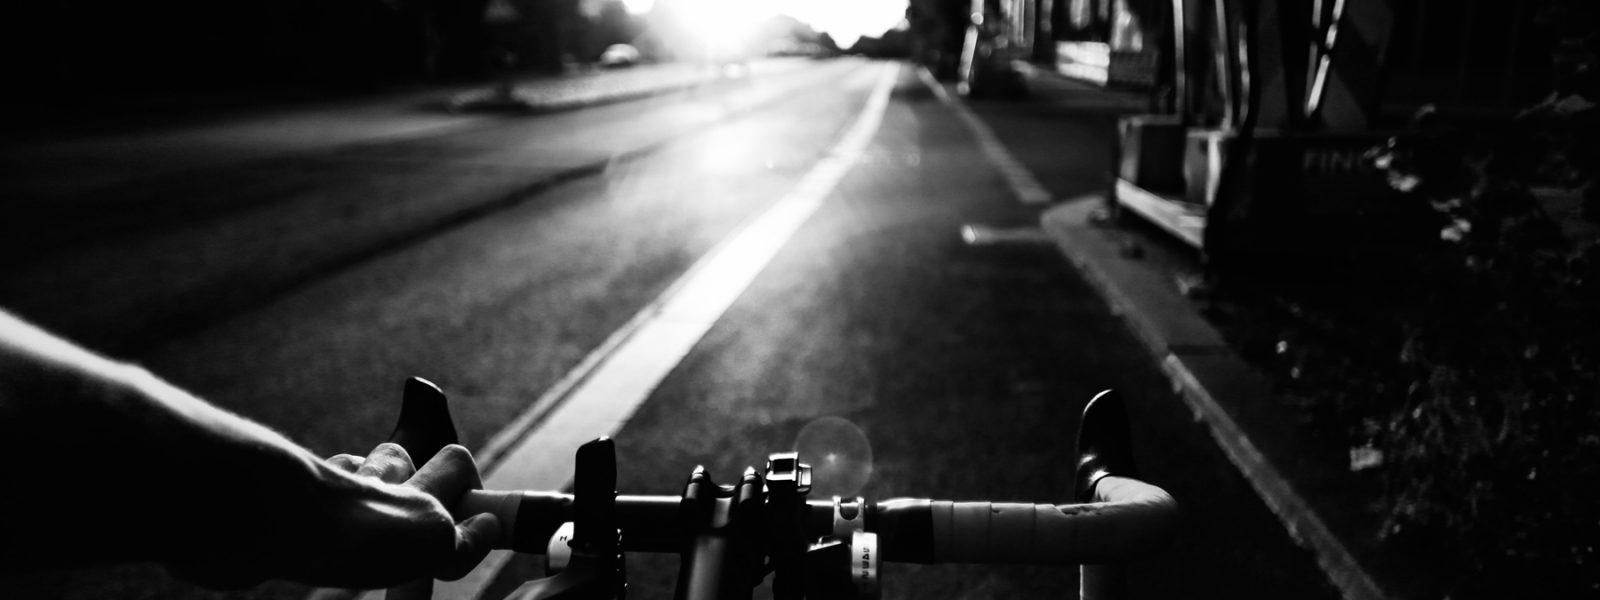 slider-fietsen-1